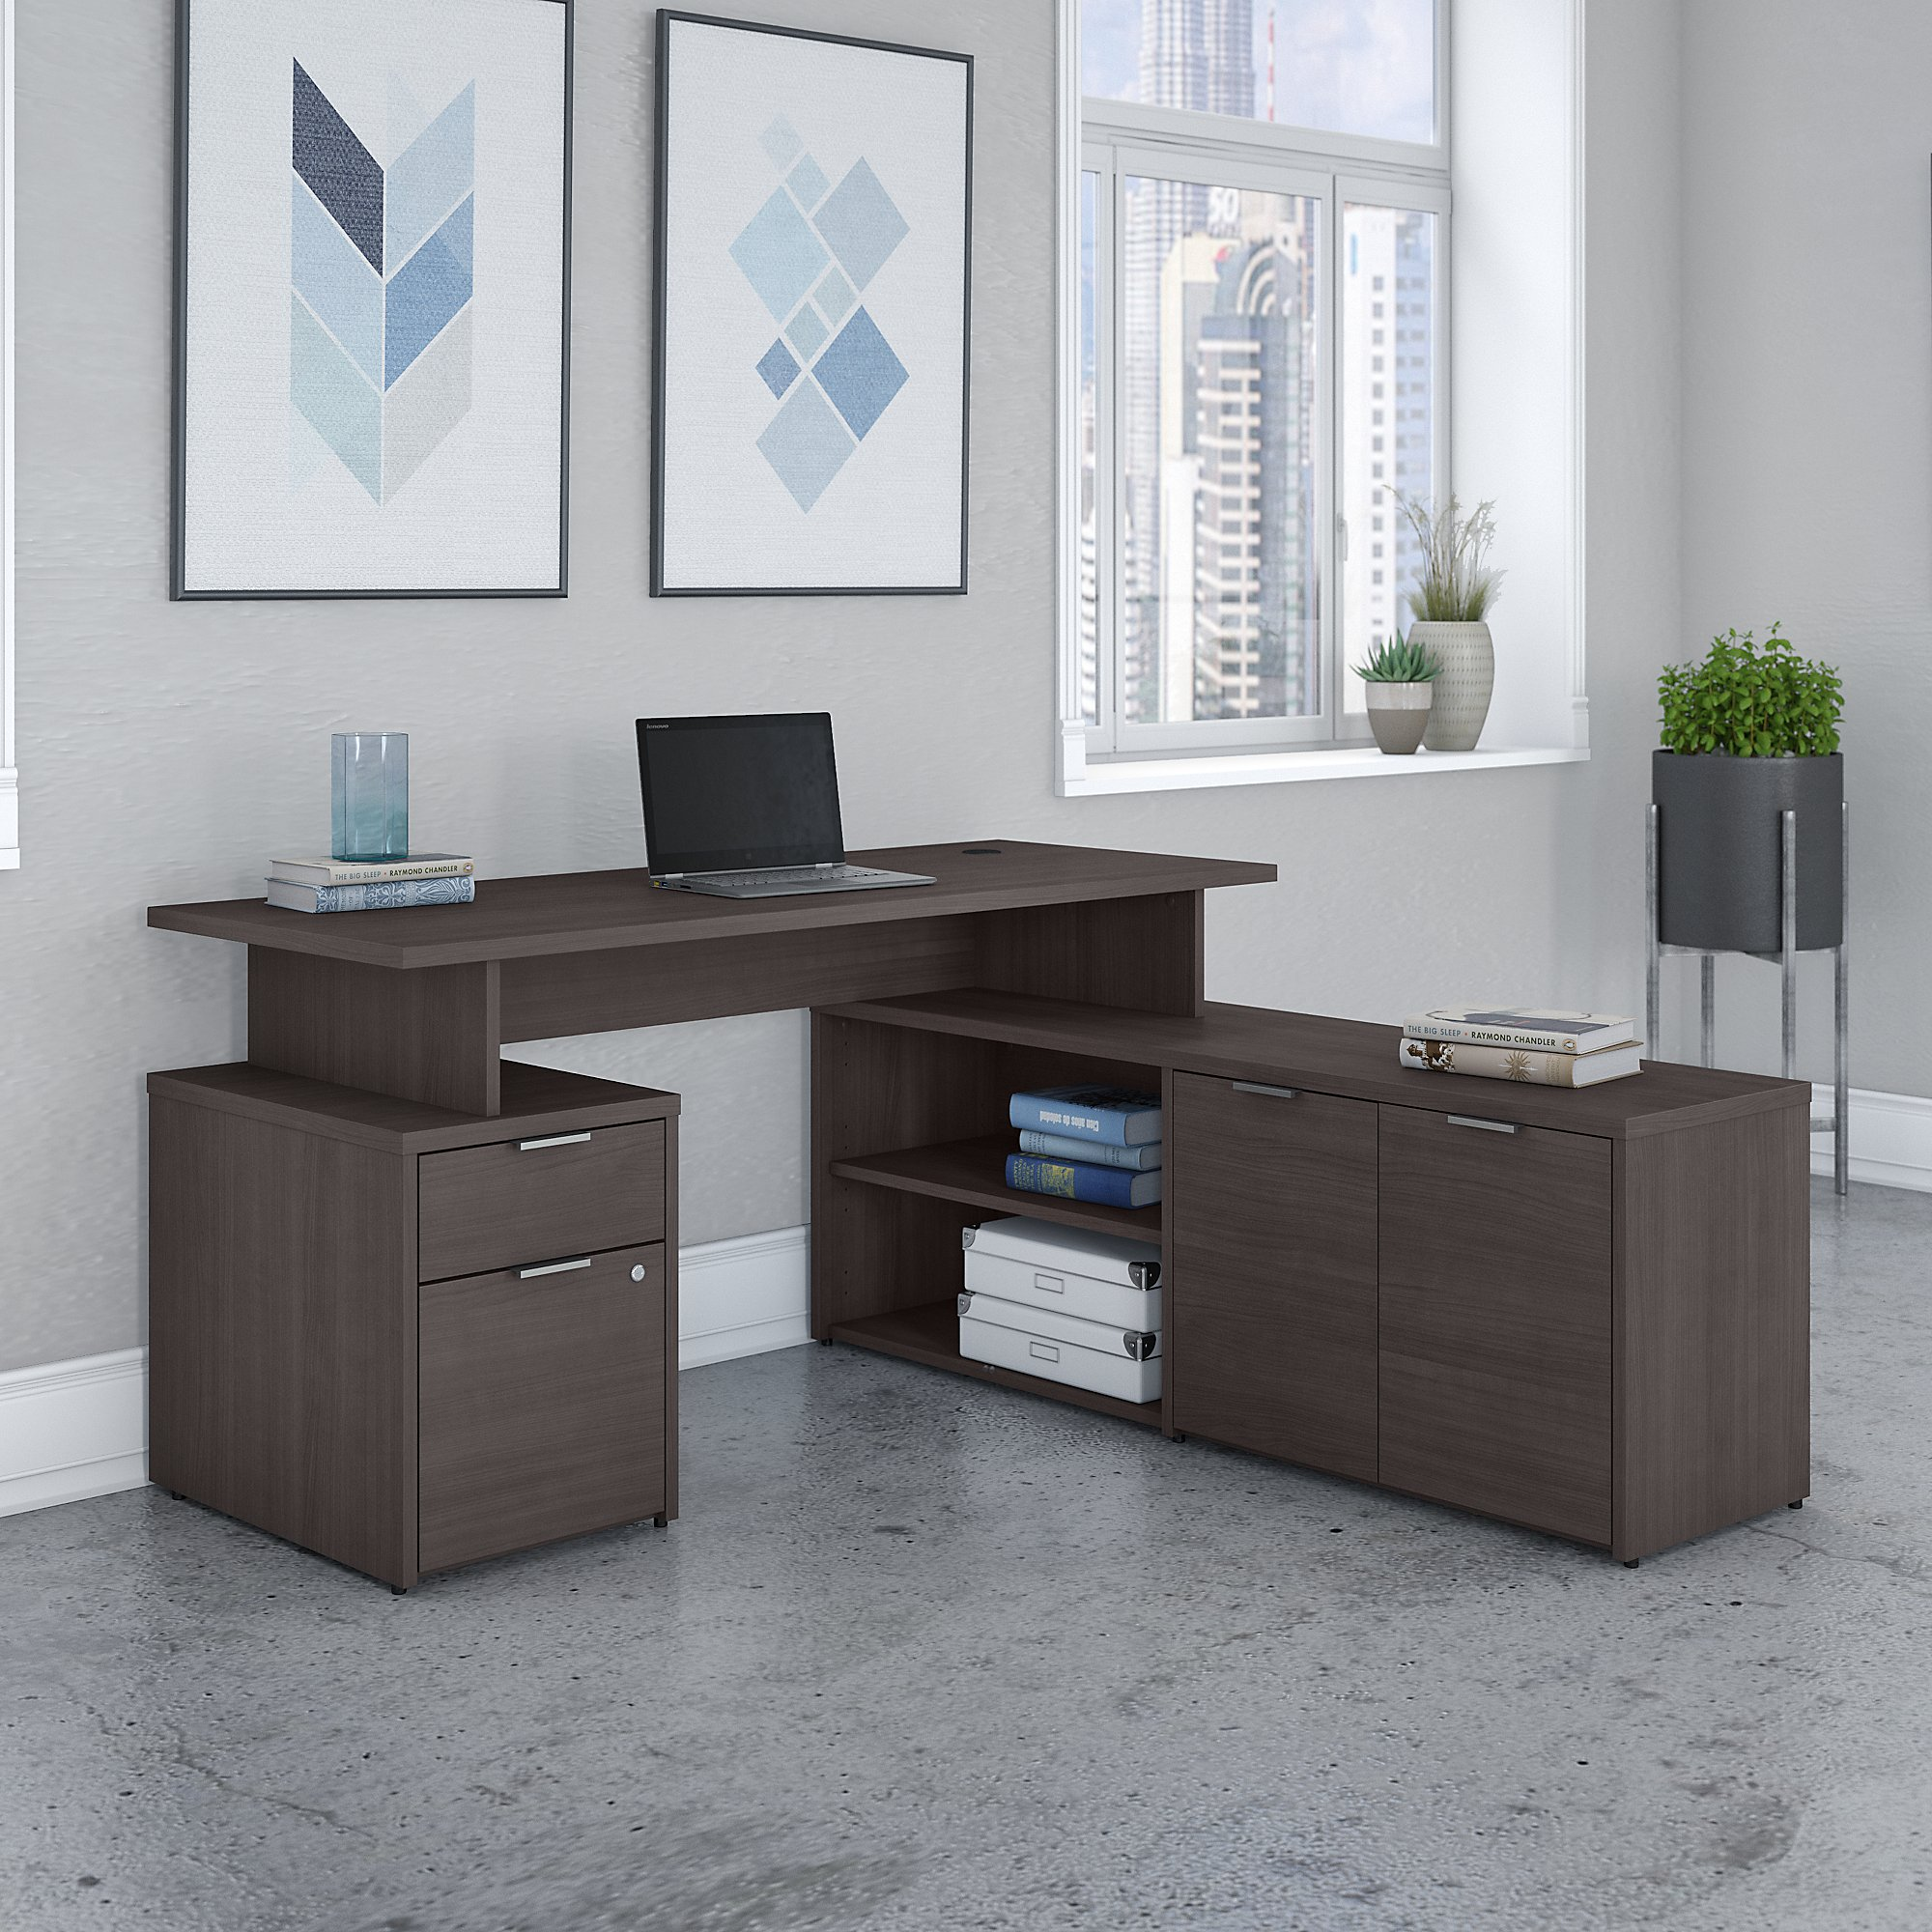 jamestown 60w storm gray l-shaped desk